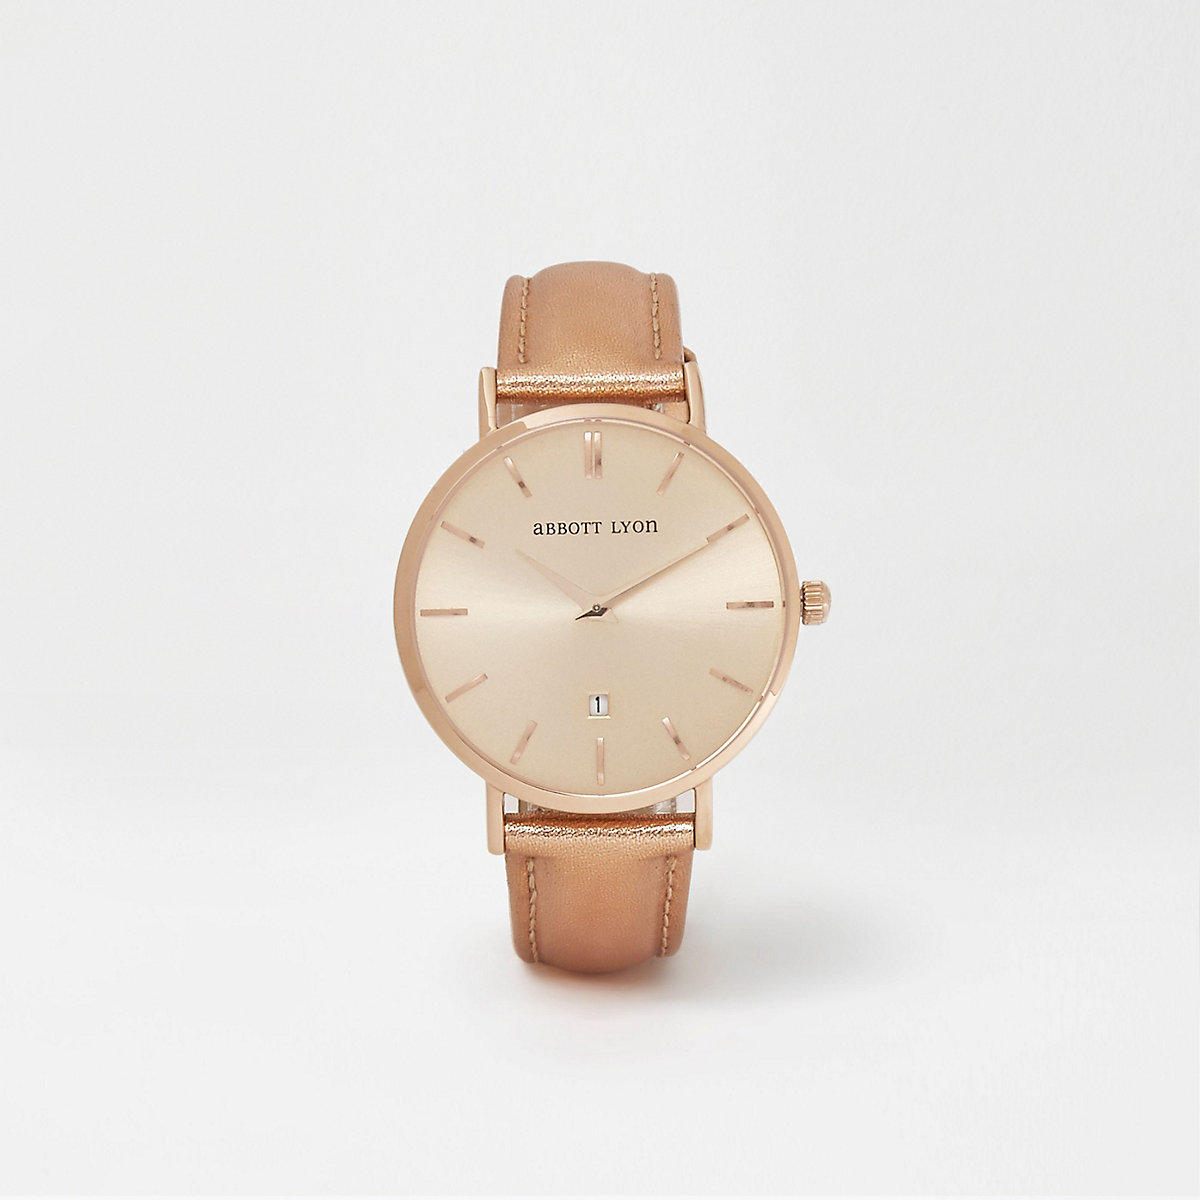 Metallic rose gold leather Abbott Lyon watch